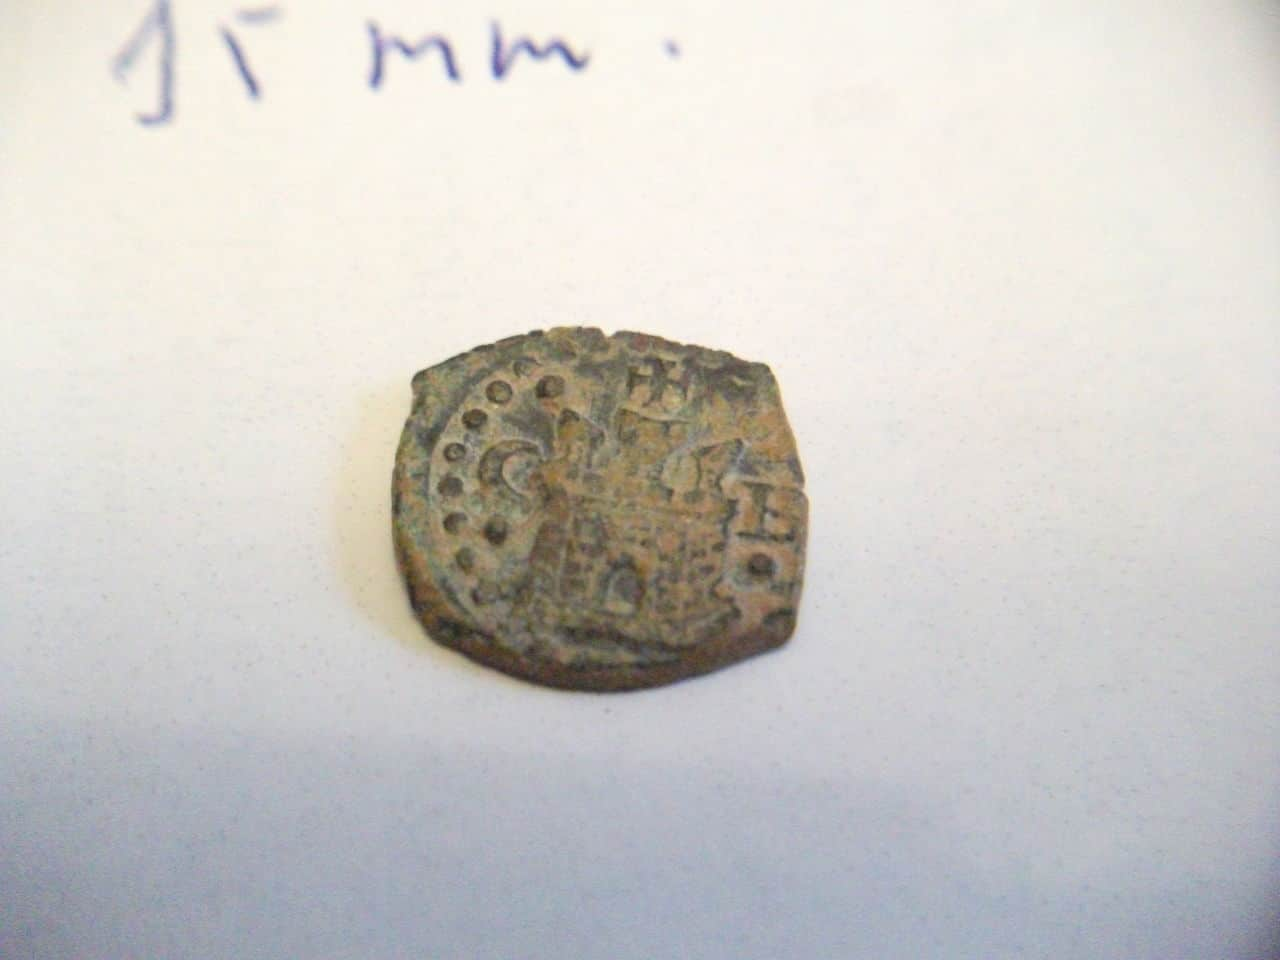 Blanca de Felipe II, de la ceca Burgos. DSCF2065